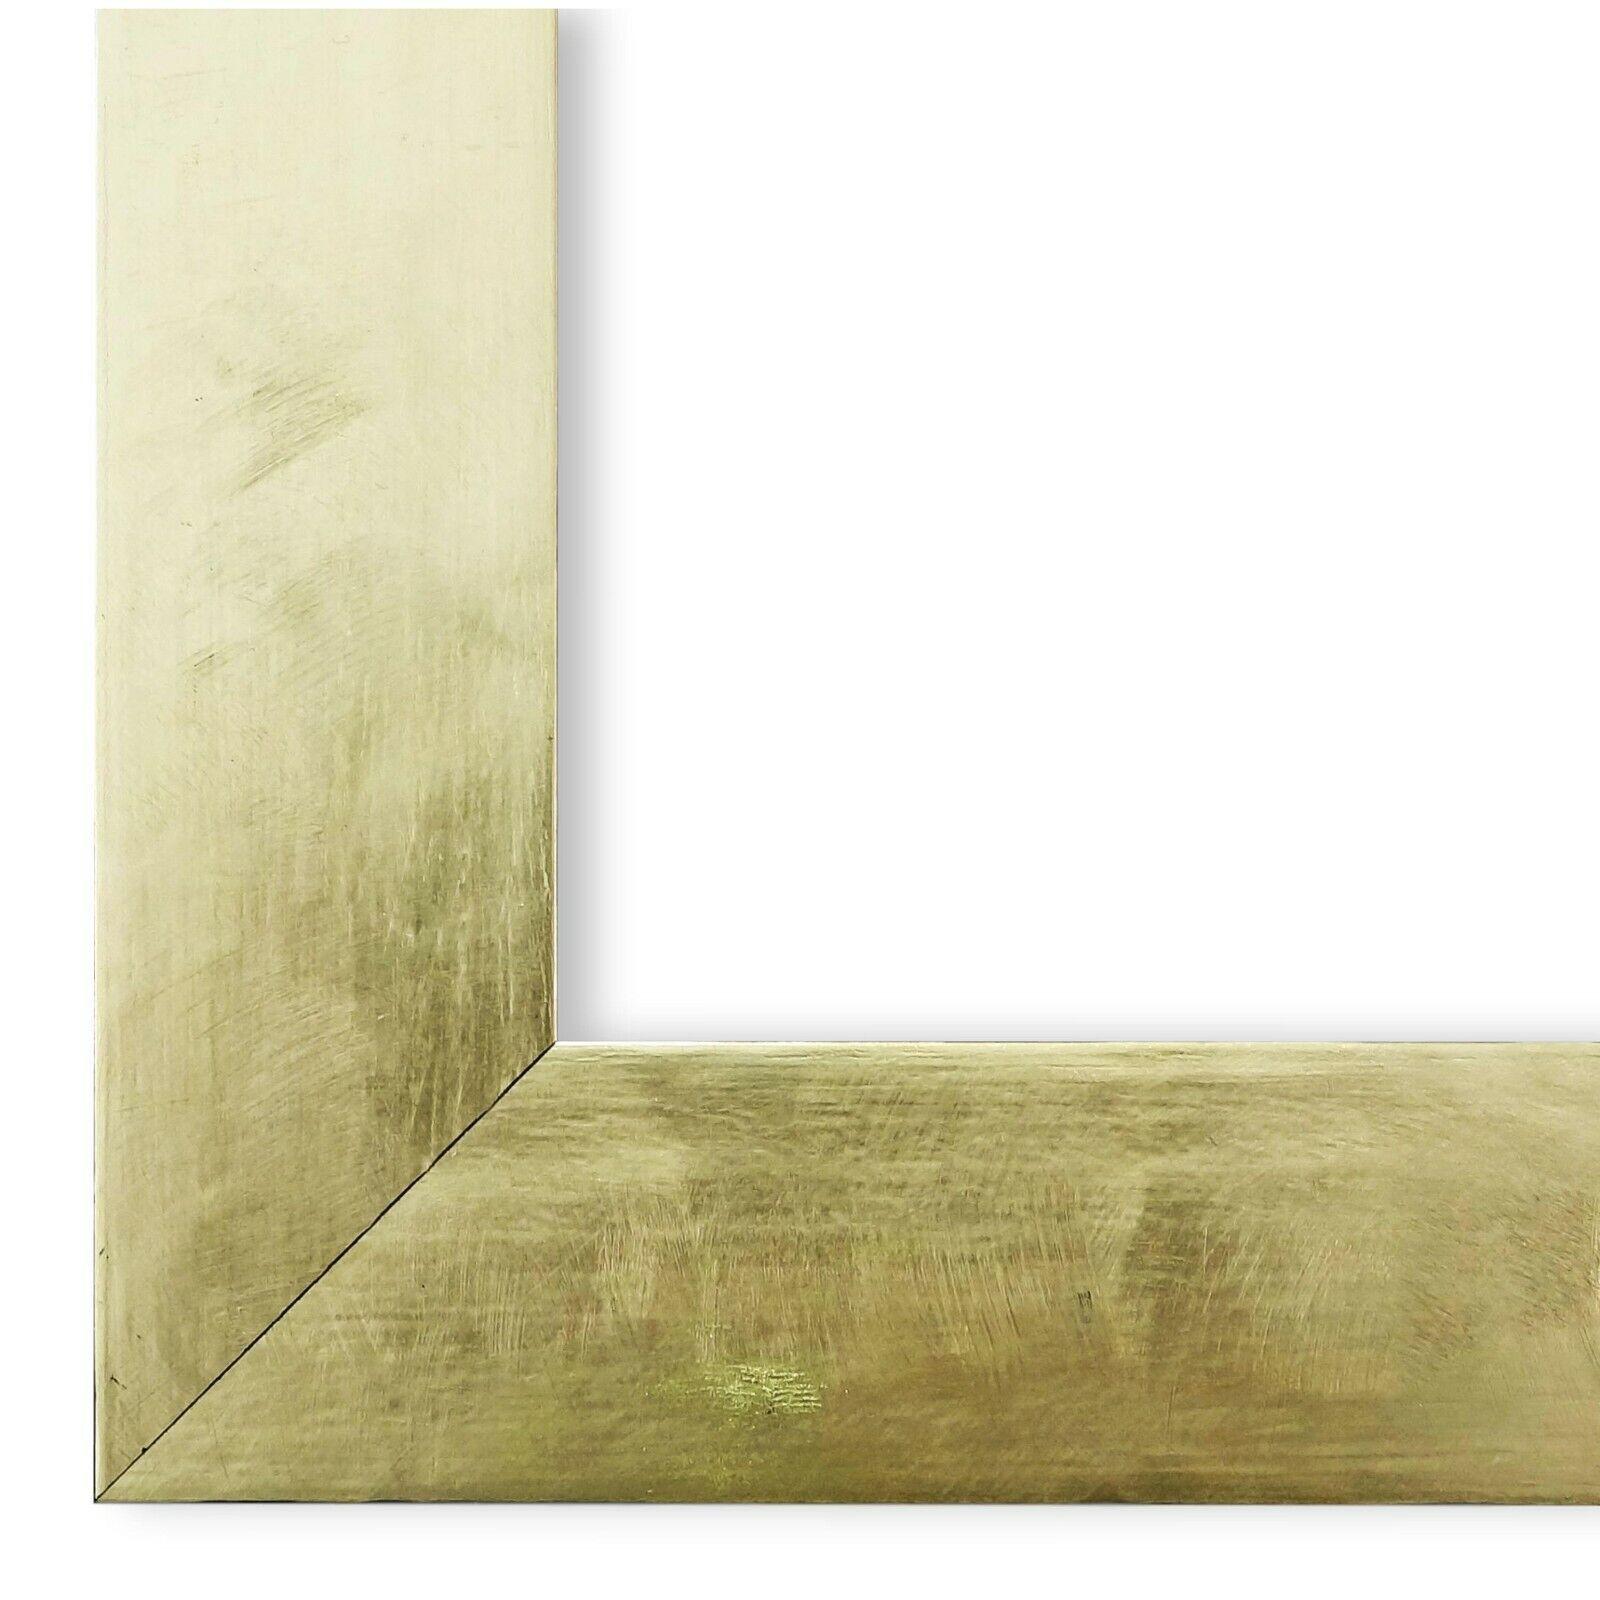 Bilderrahmen Rahmen Gold Shabby Retro Holz Lecce 3,9 - NEU alle Größen